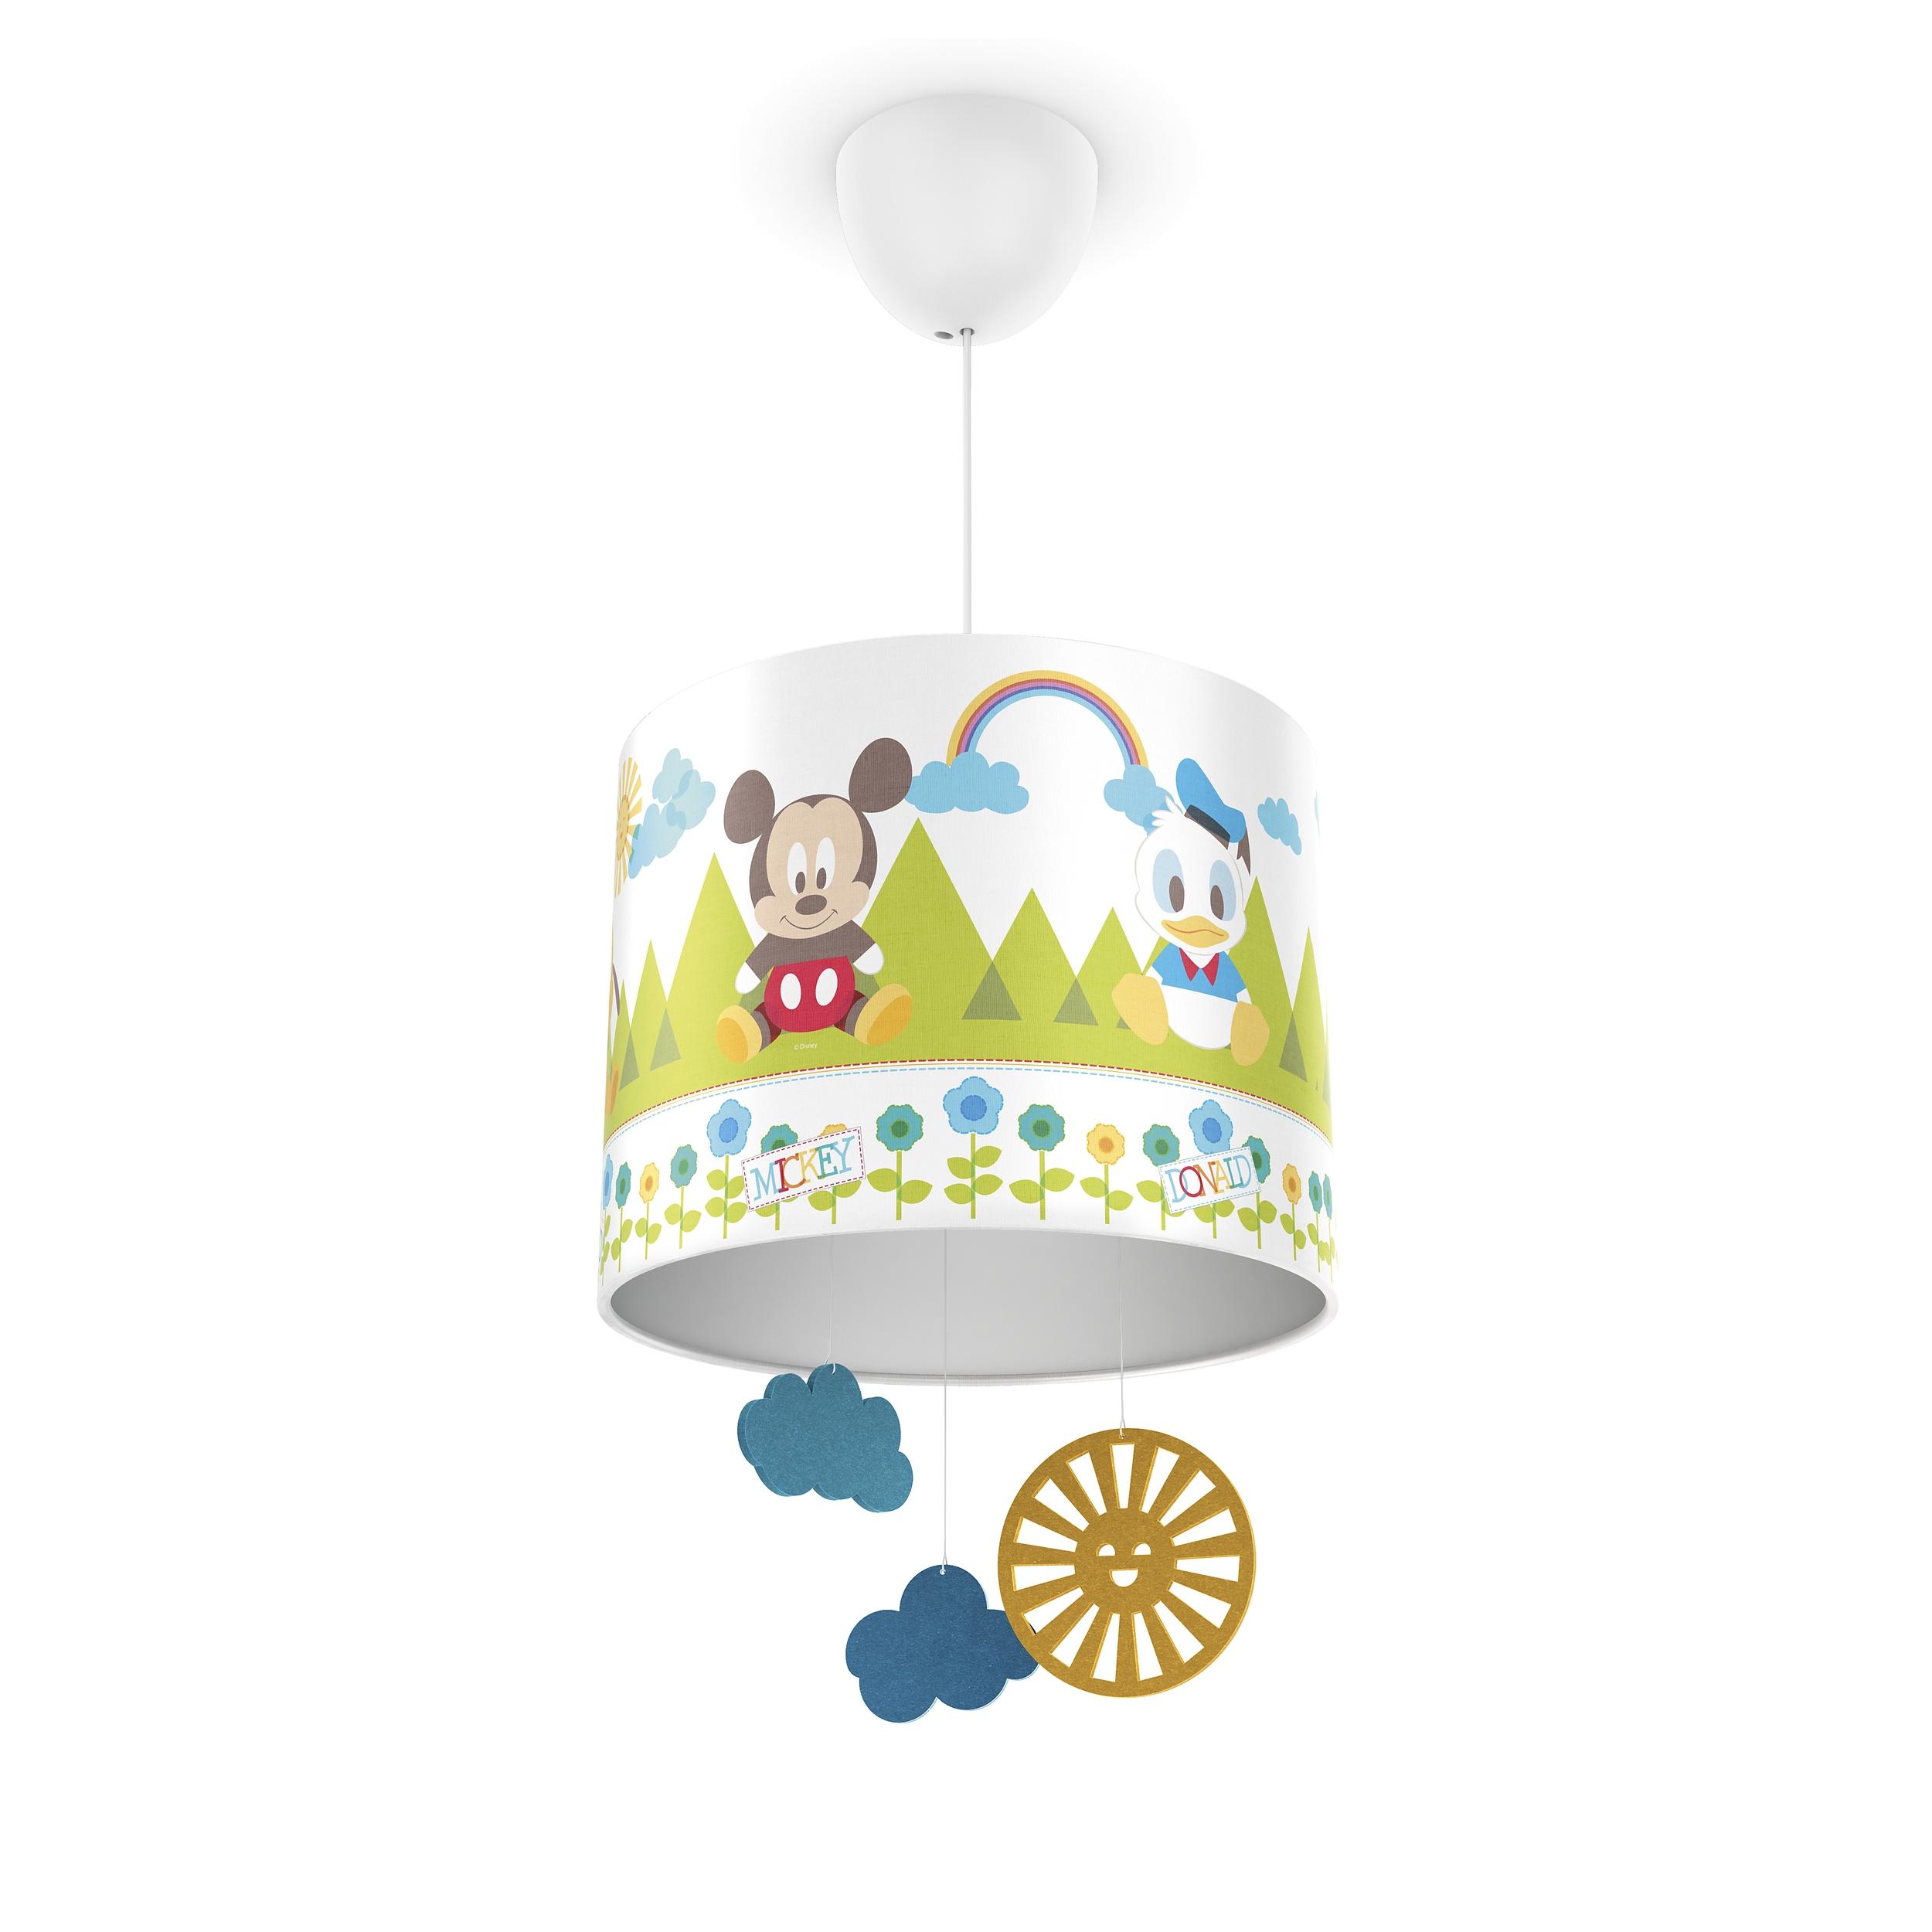 Philips lampe kinderzimmer disney pendelleuchte mickey for Disney kinderzimmer